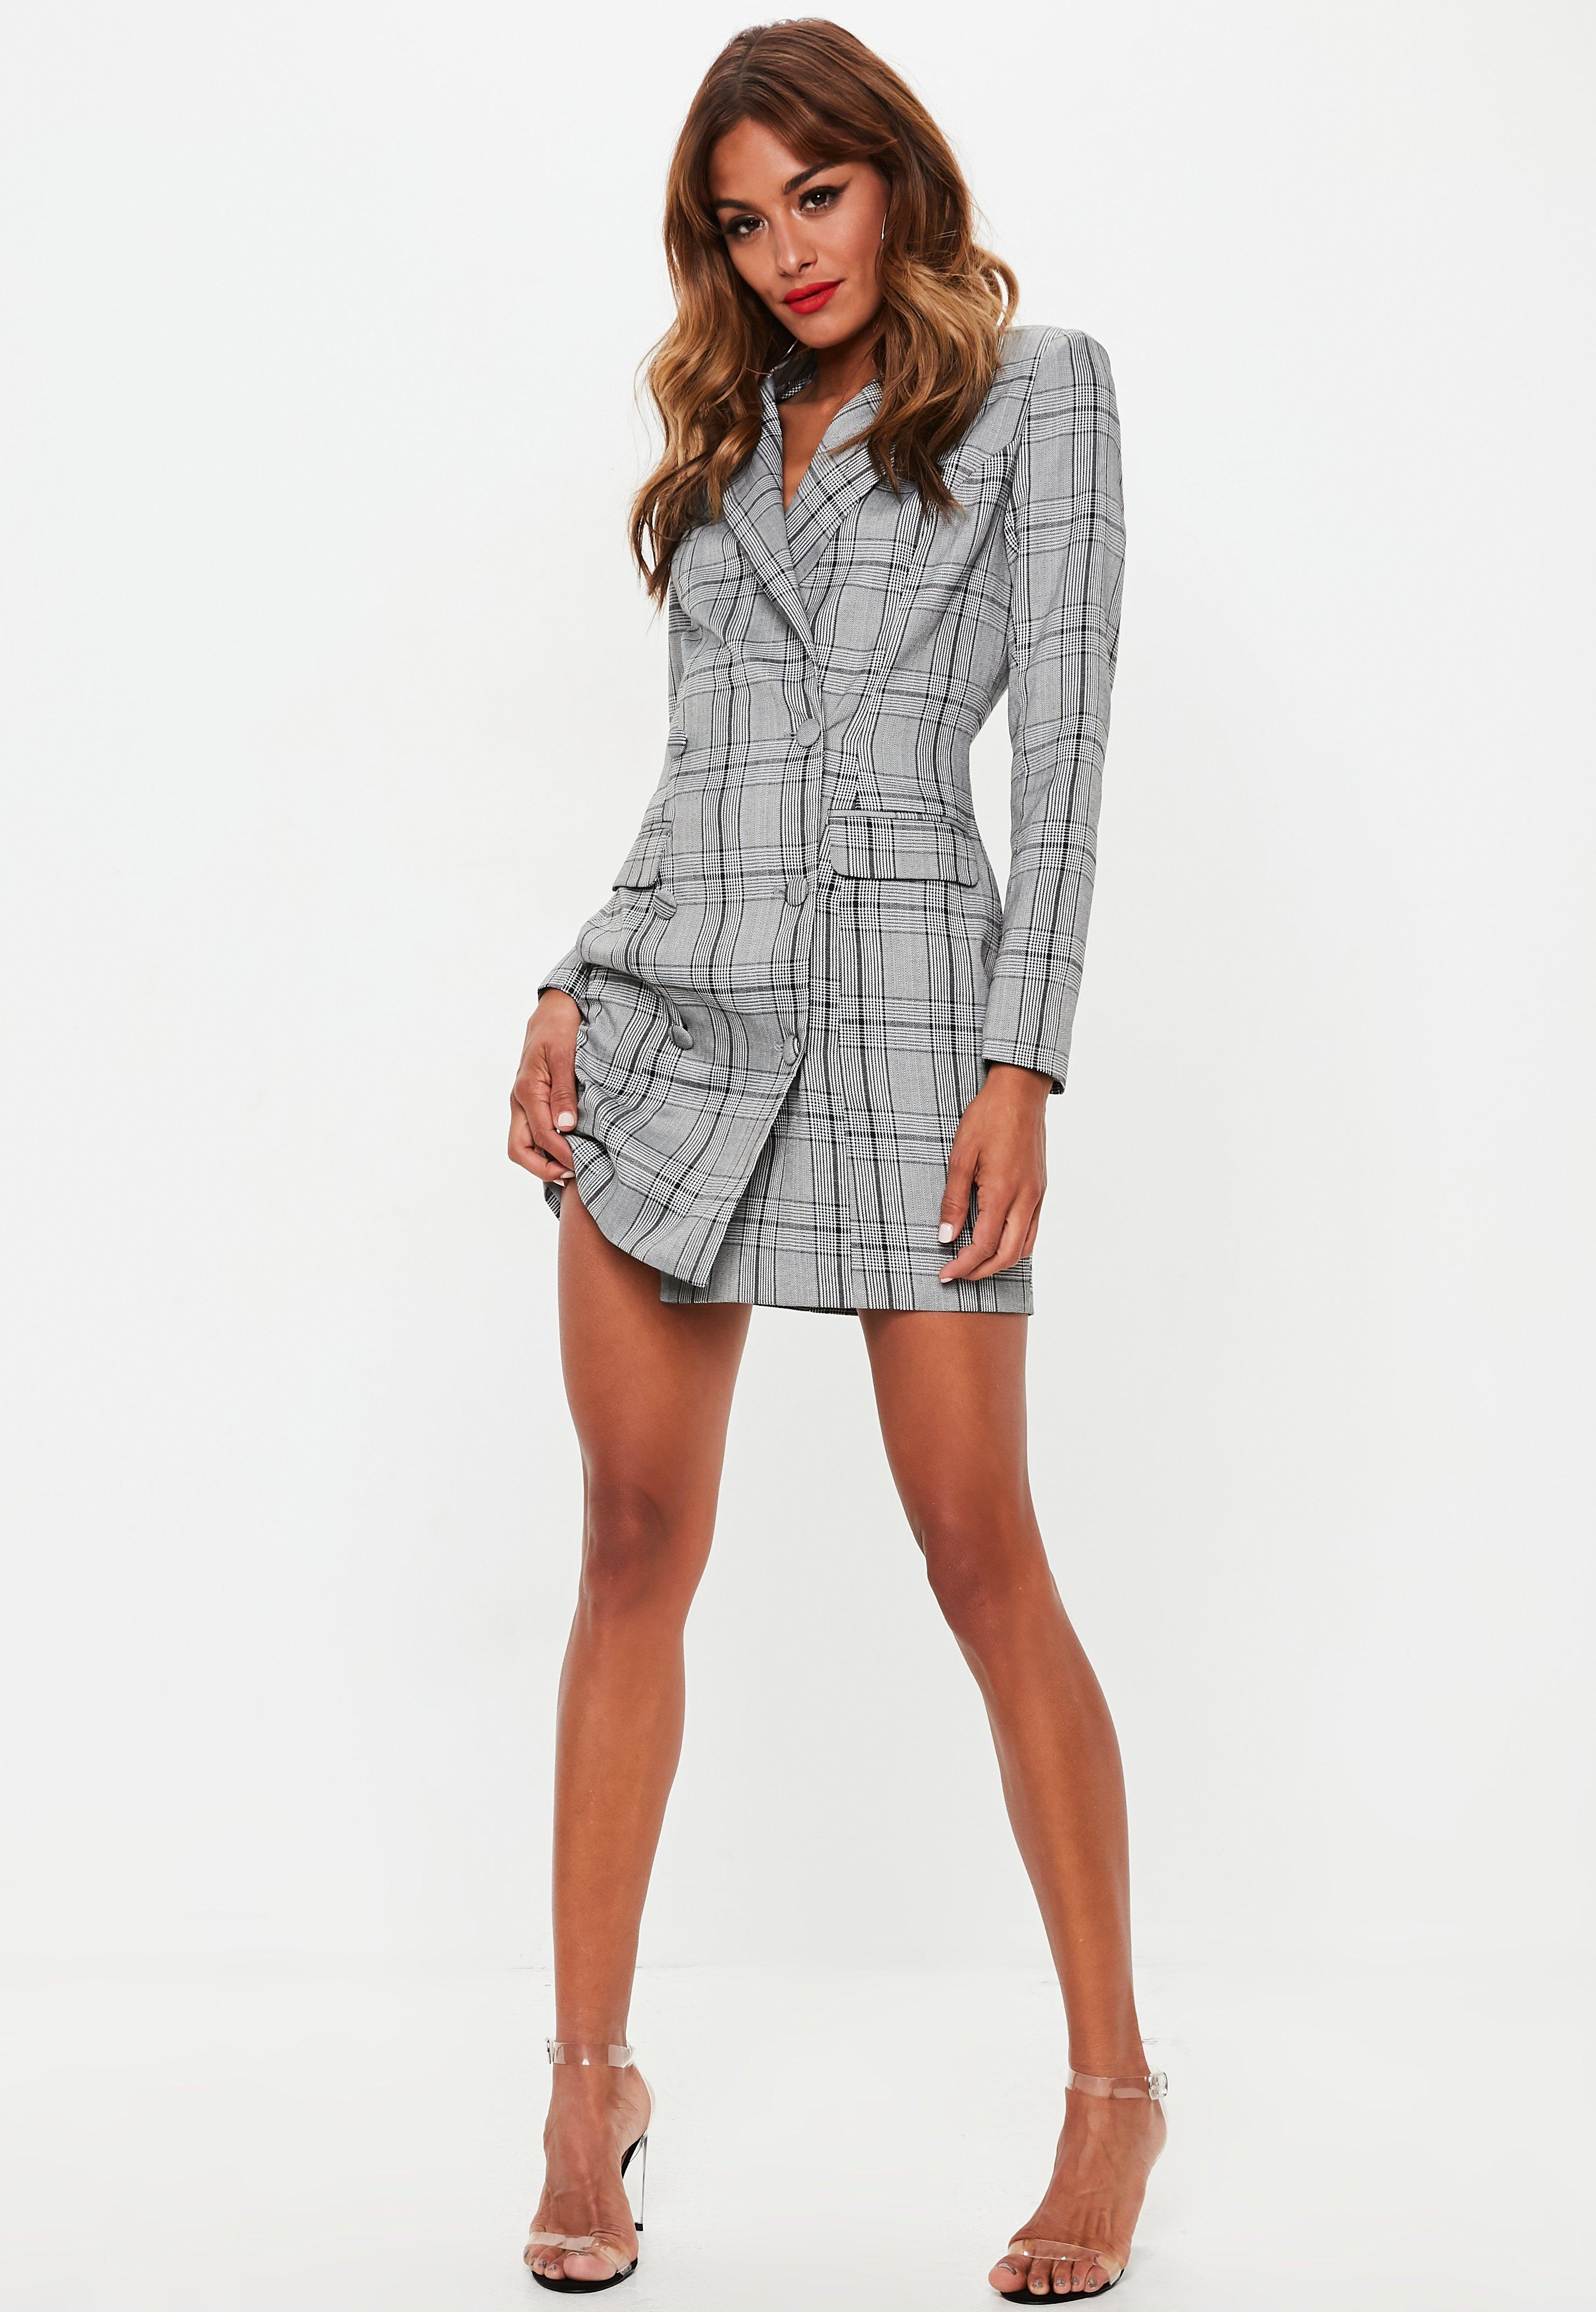 b8d504dc575 Gray Hertie Plaid Blazer Dress Missd